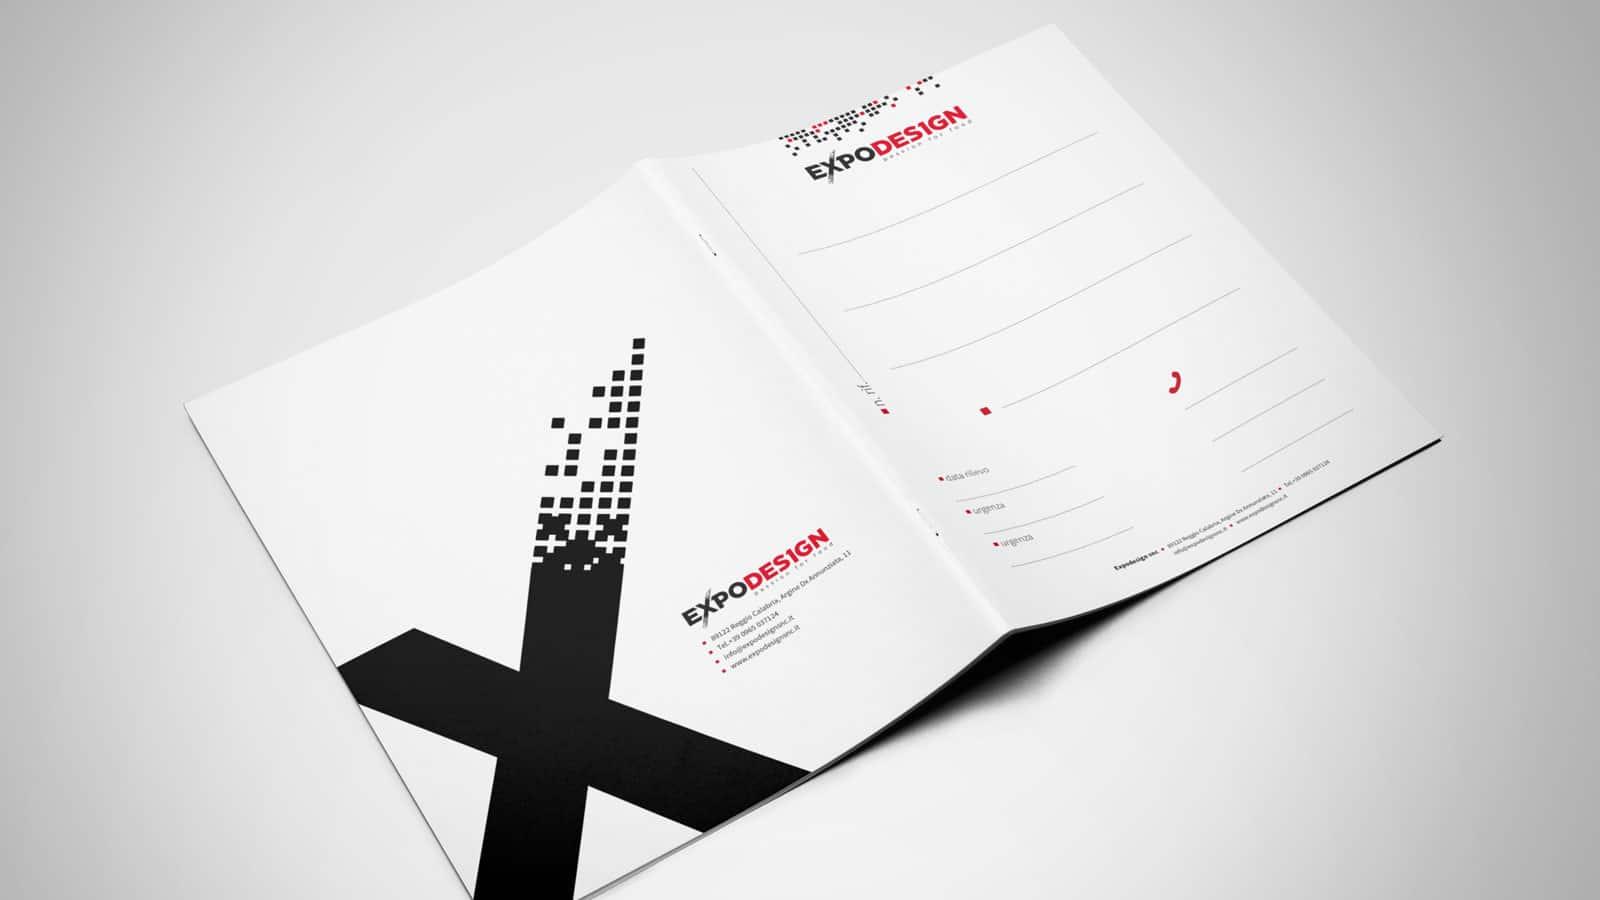 bisestyle-idee-expodesign-slider-4